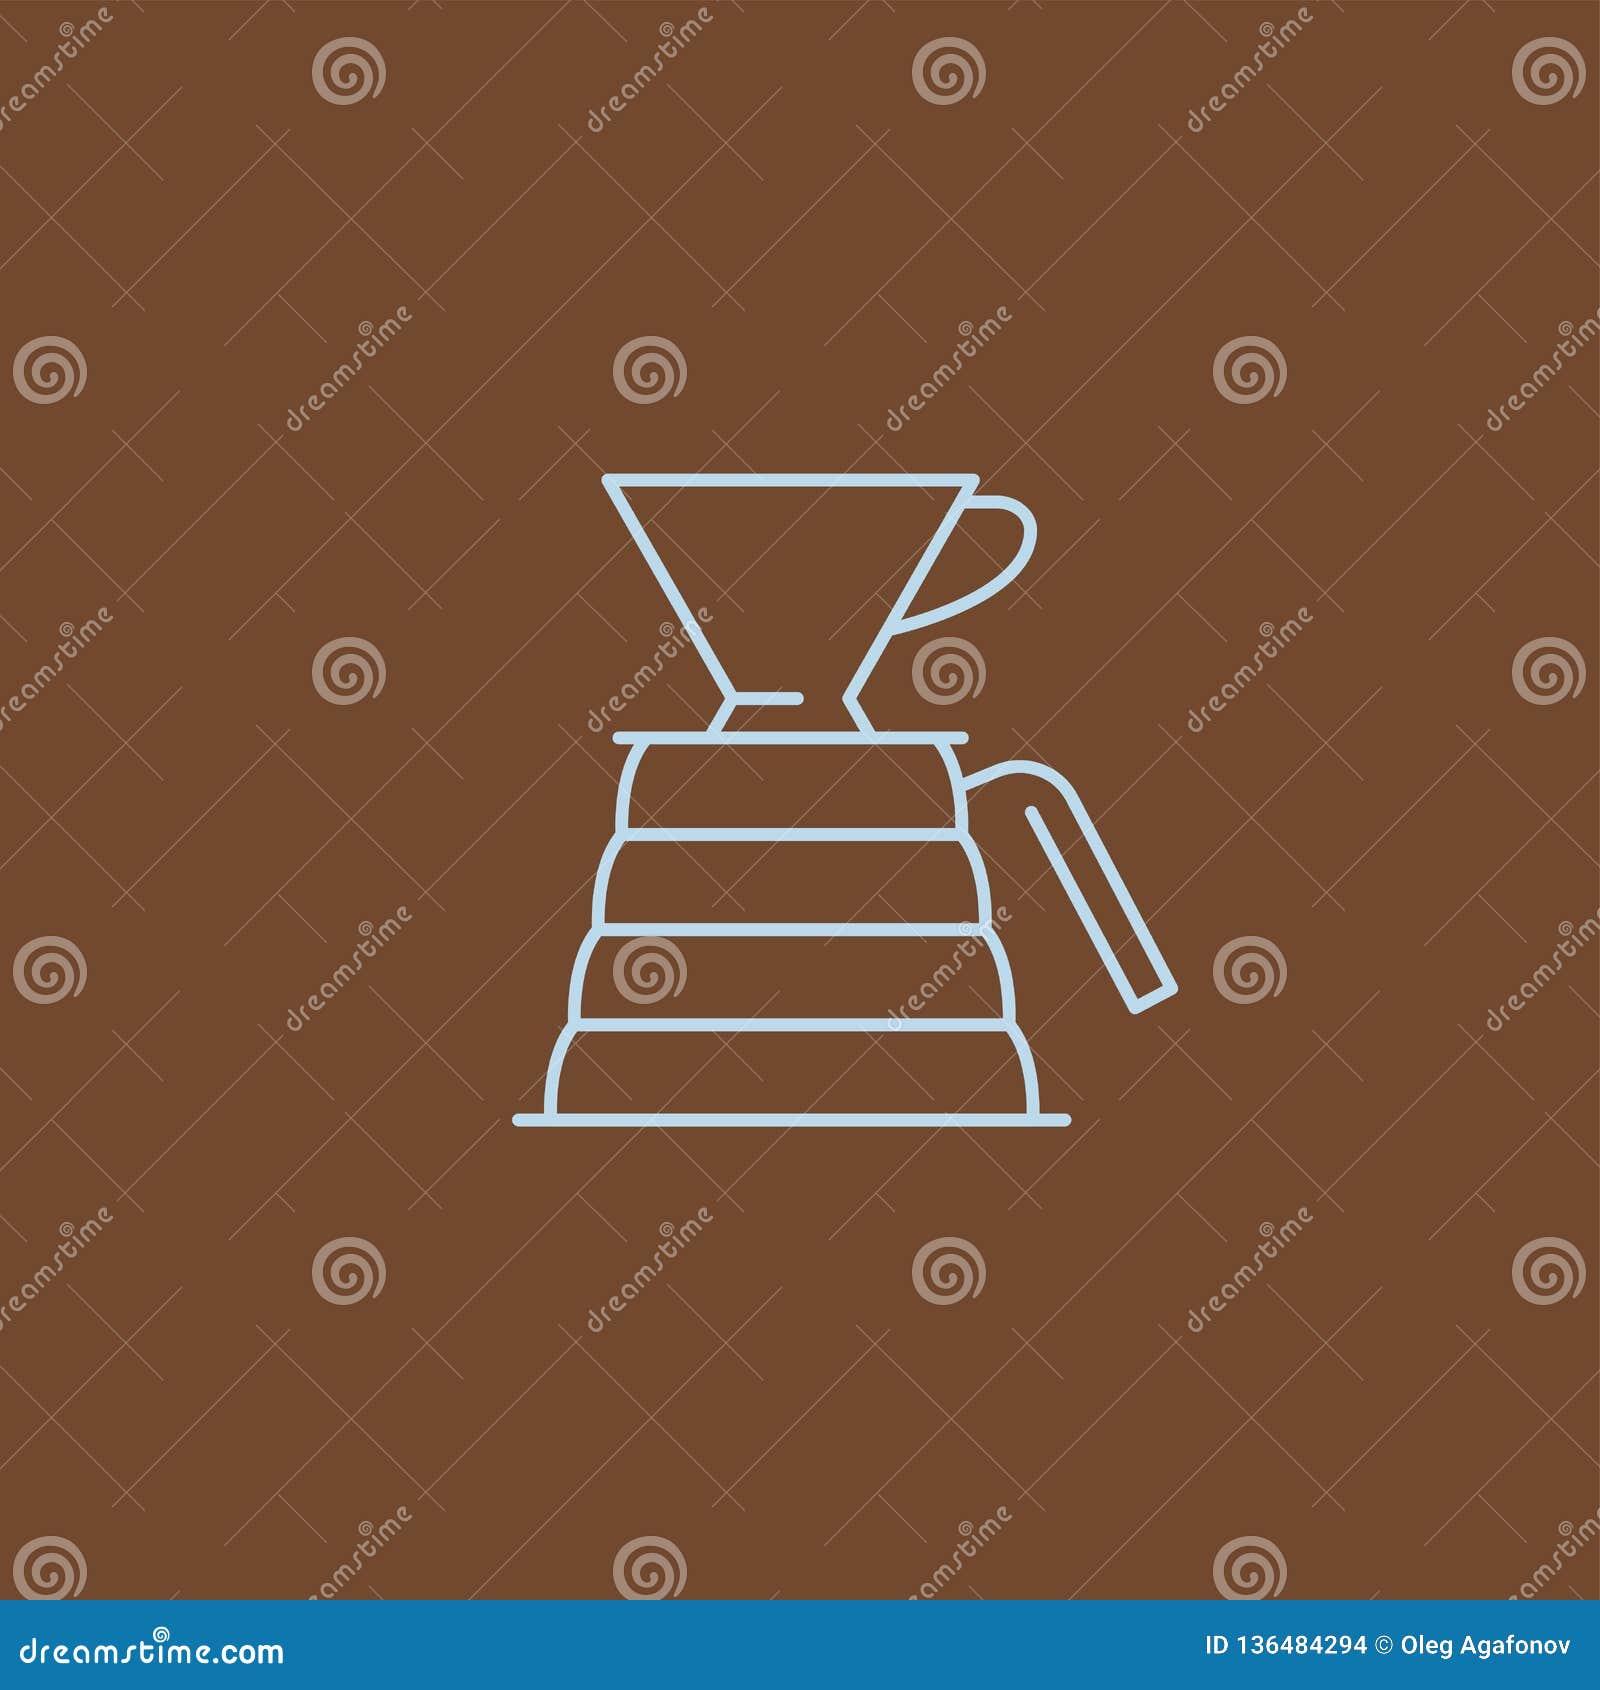 Kawowy ikona emblemat, liniowa cukierniana odznaka